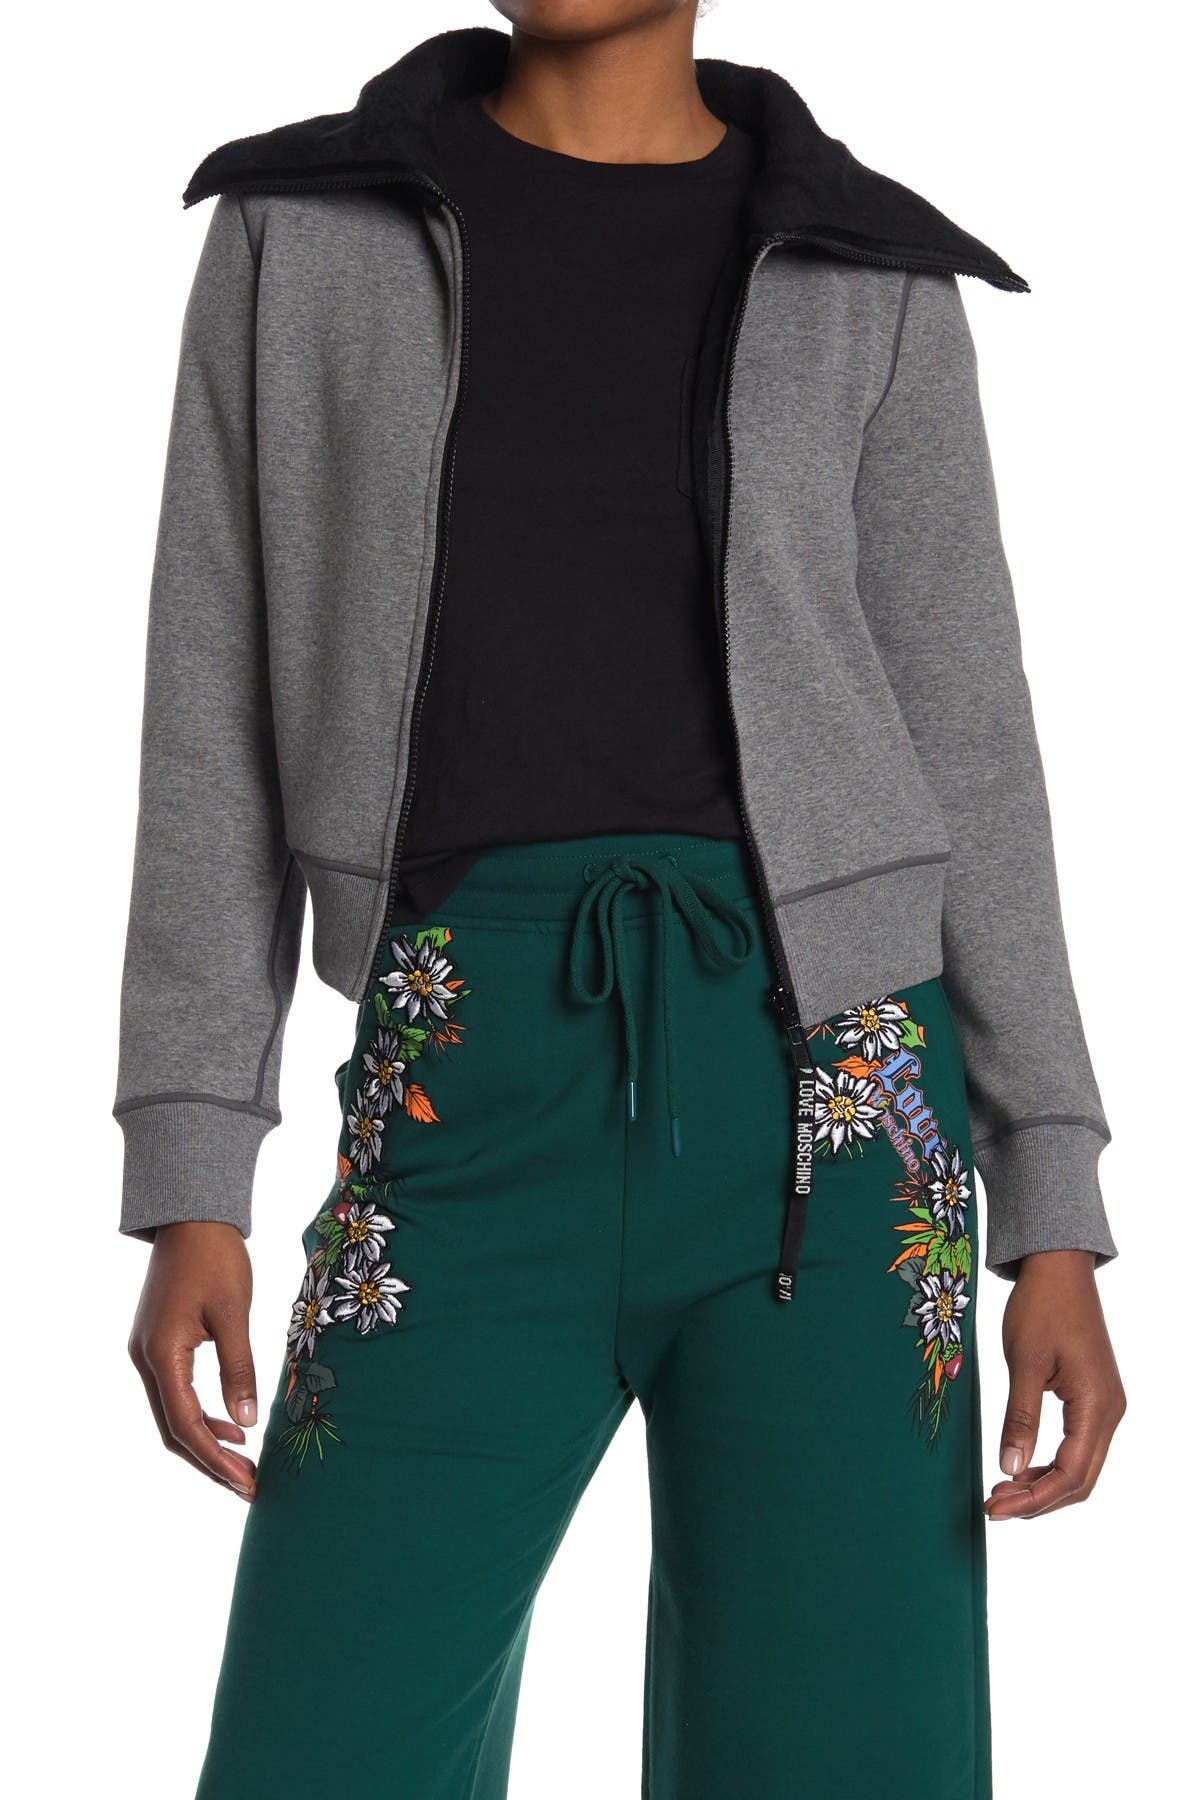 Image of LOVE Moschino Reversible Jacket